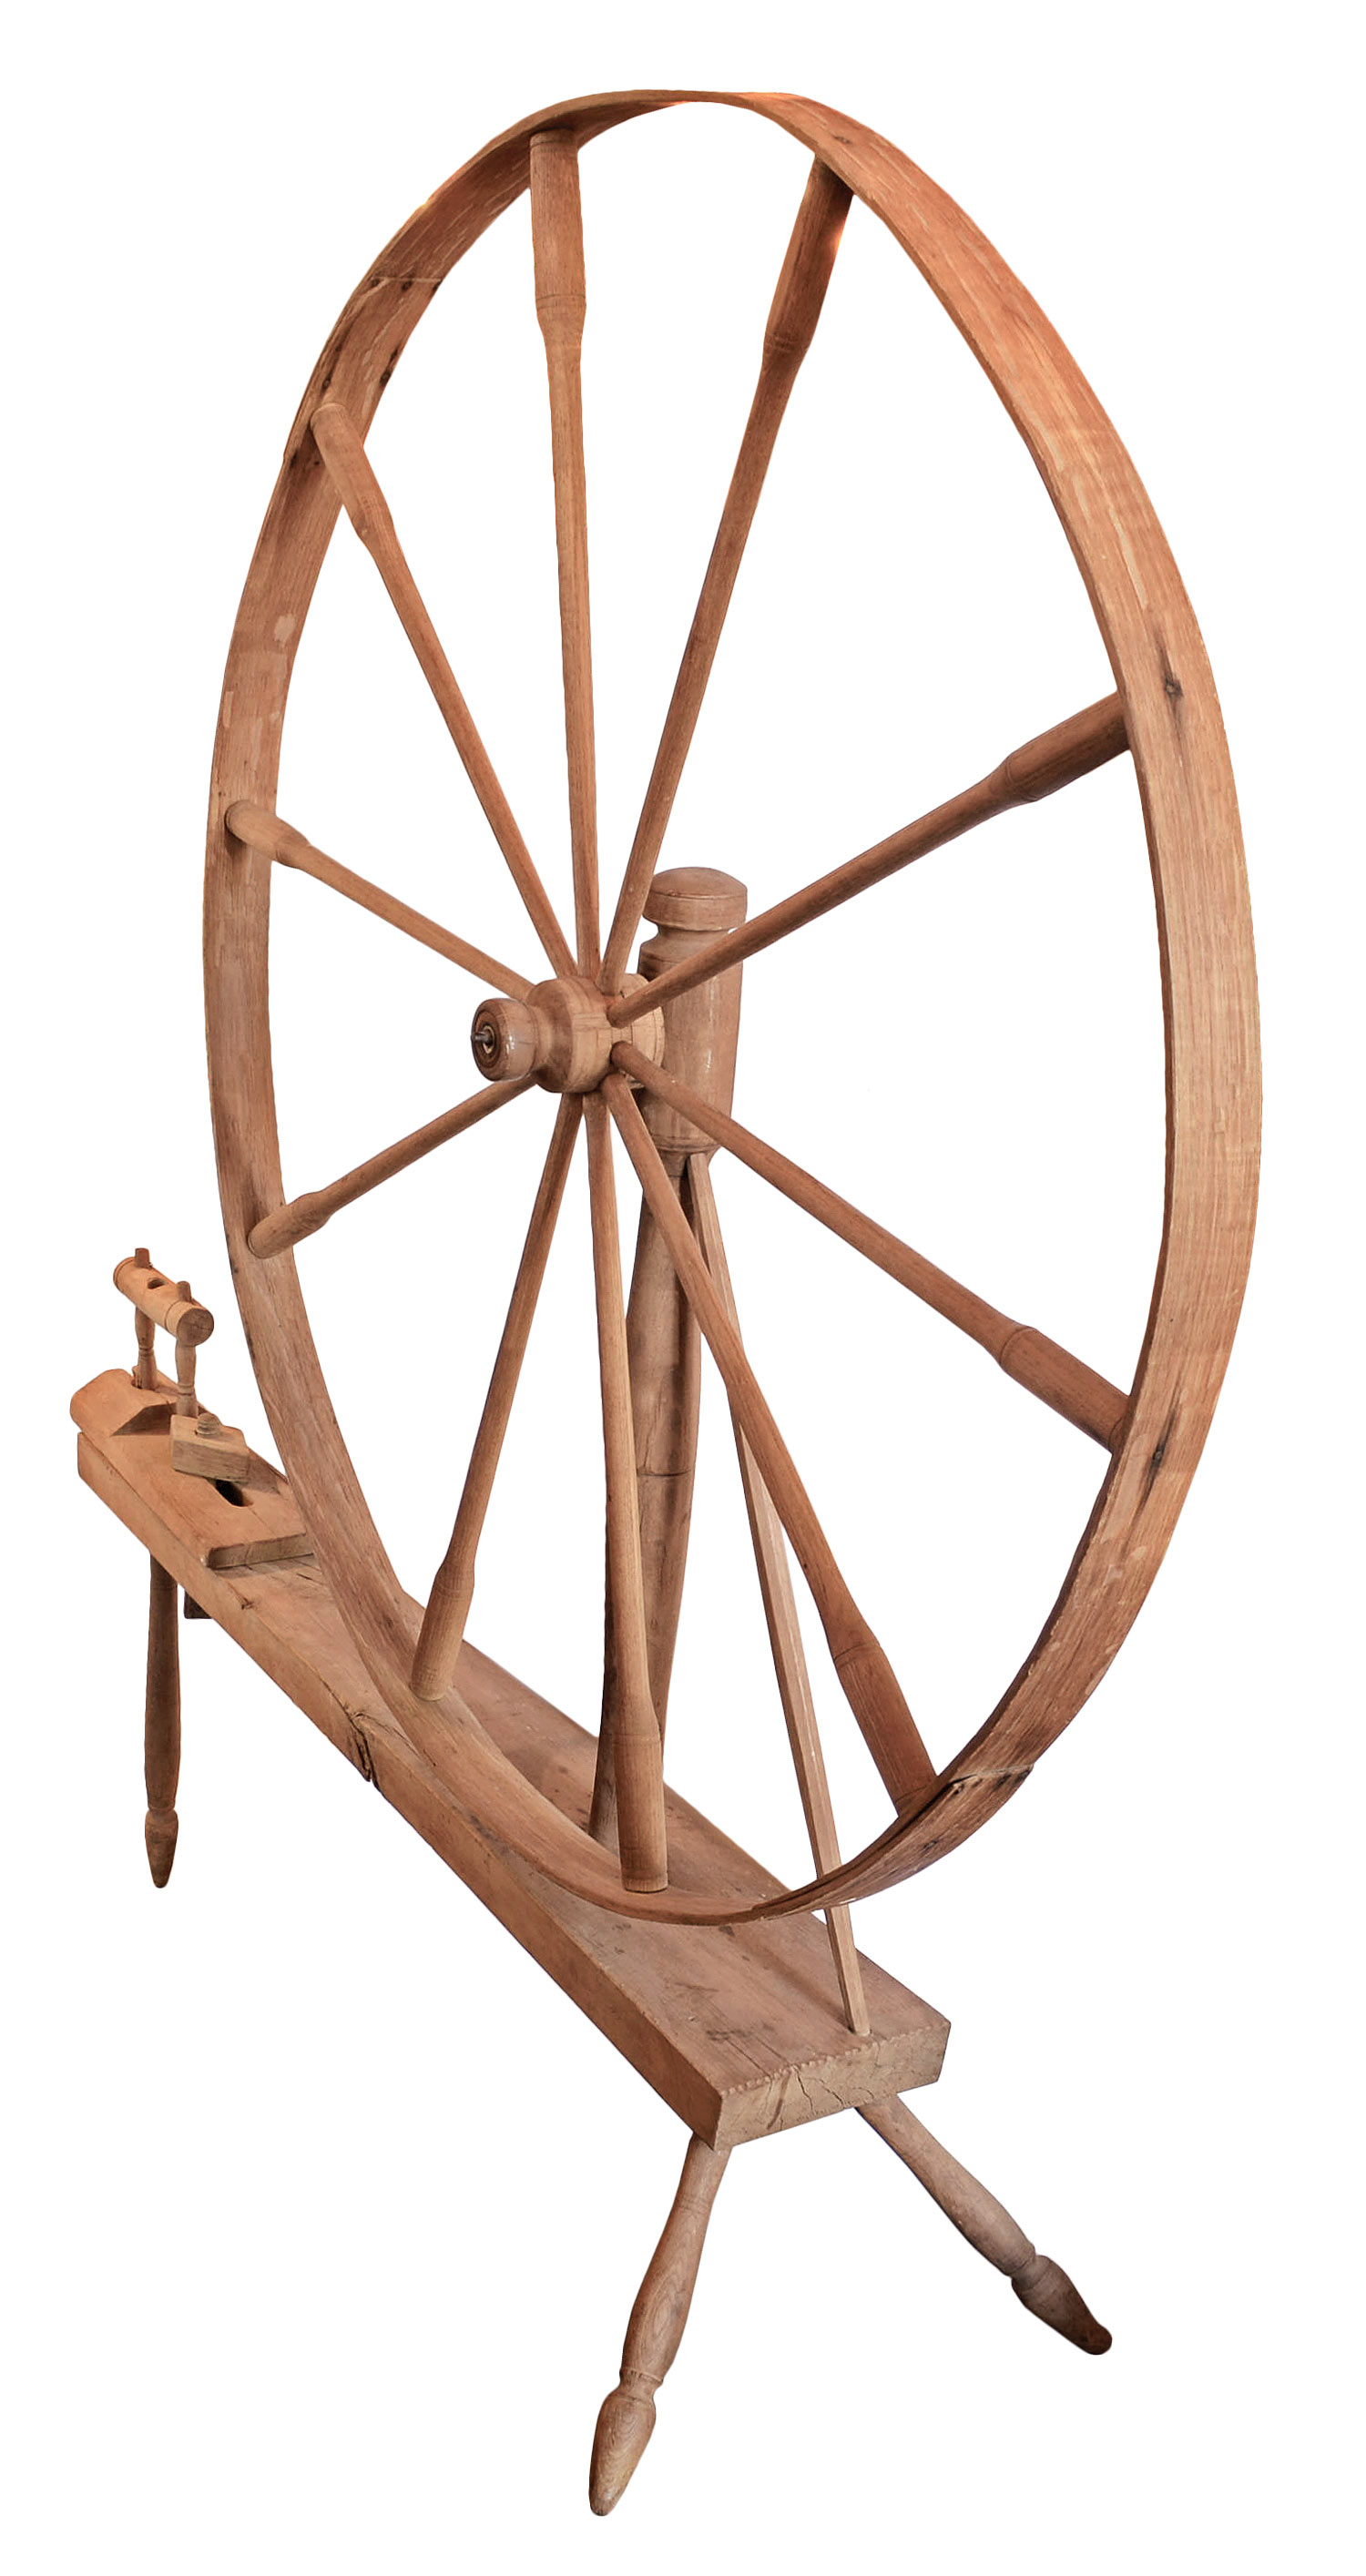 45707-spinning-wheel-angle.jpg